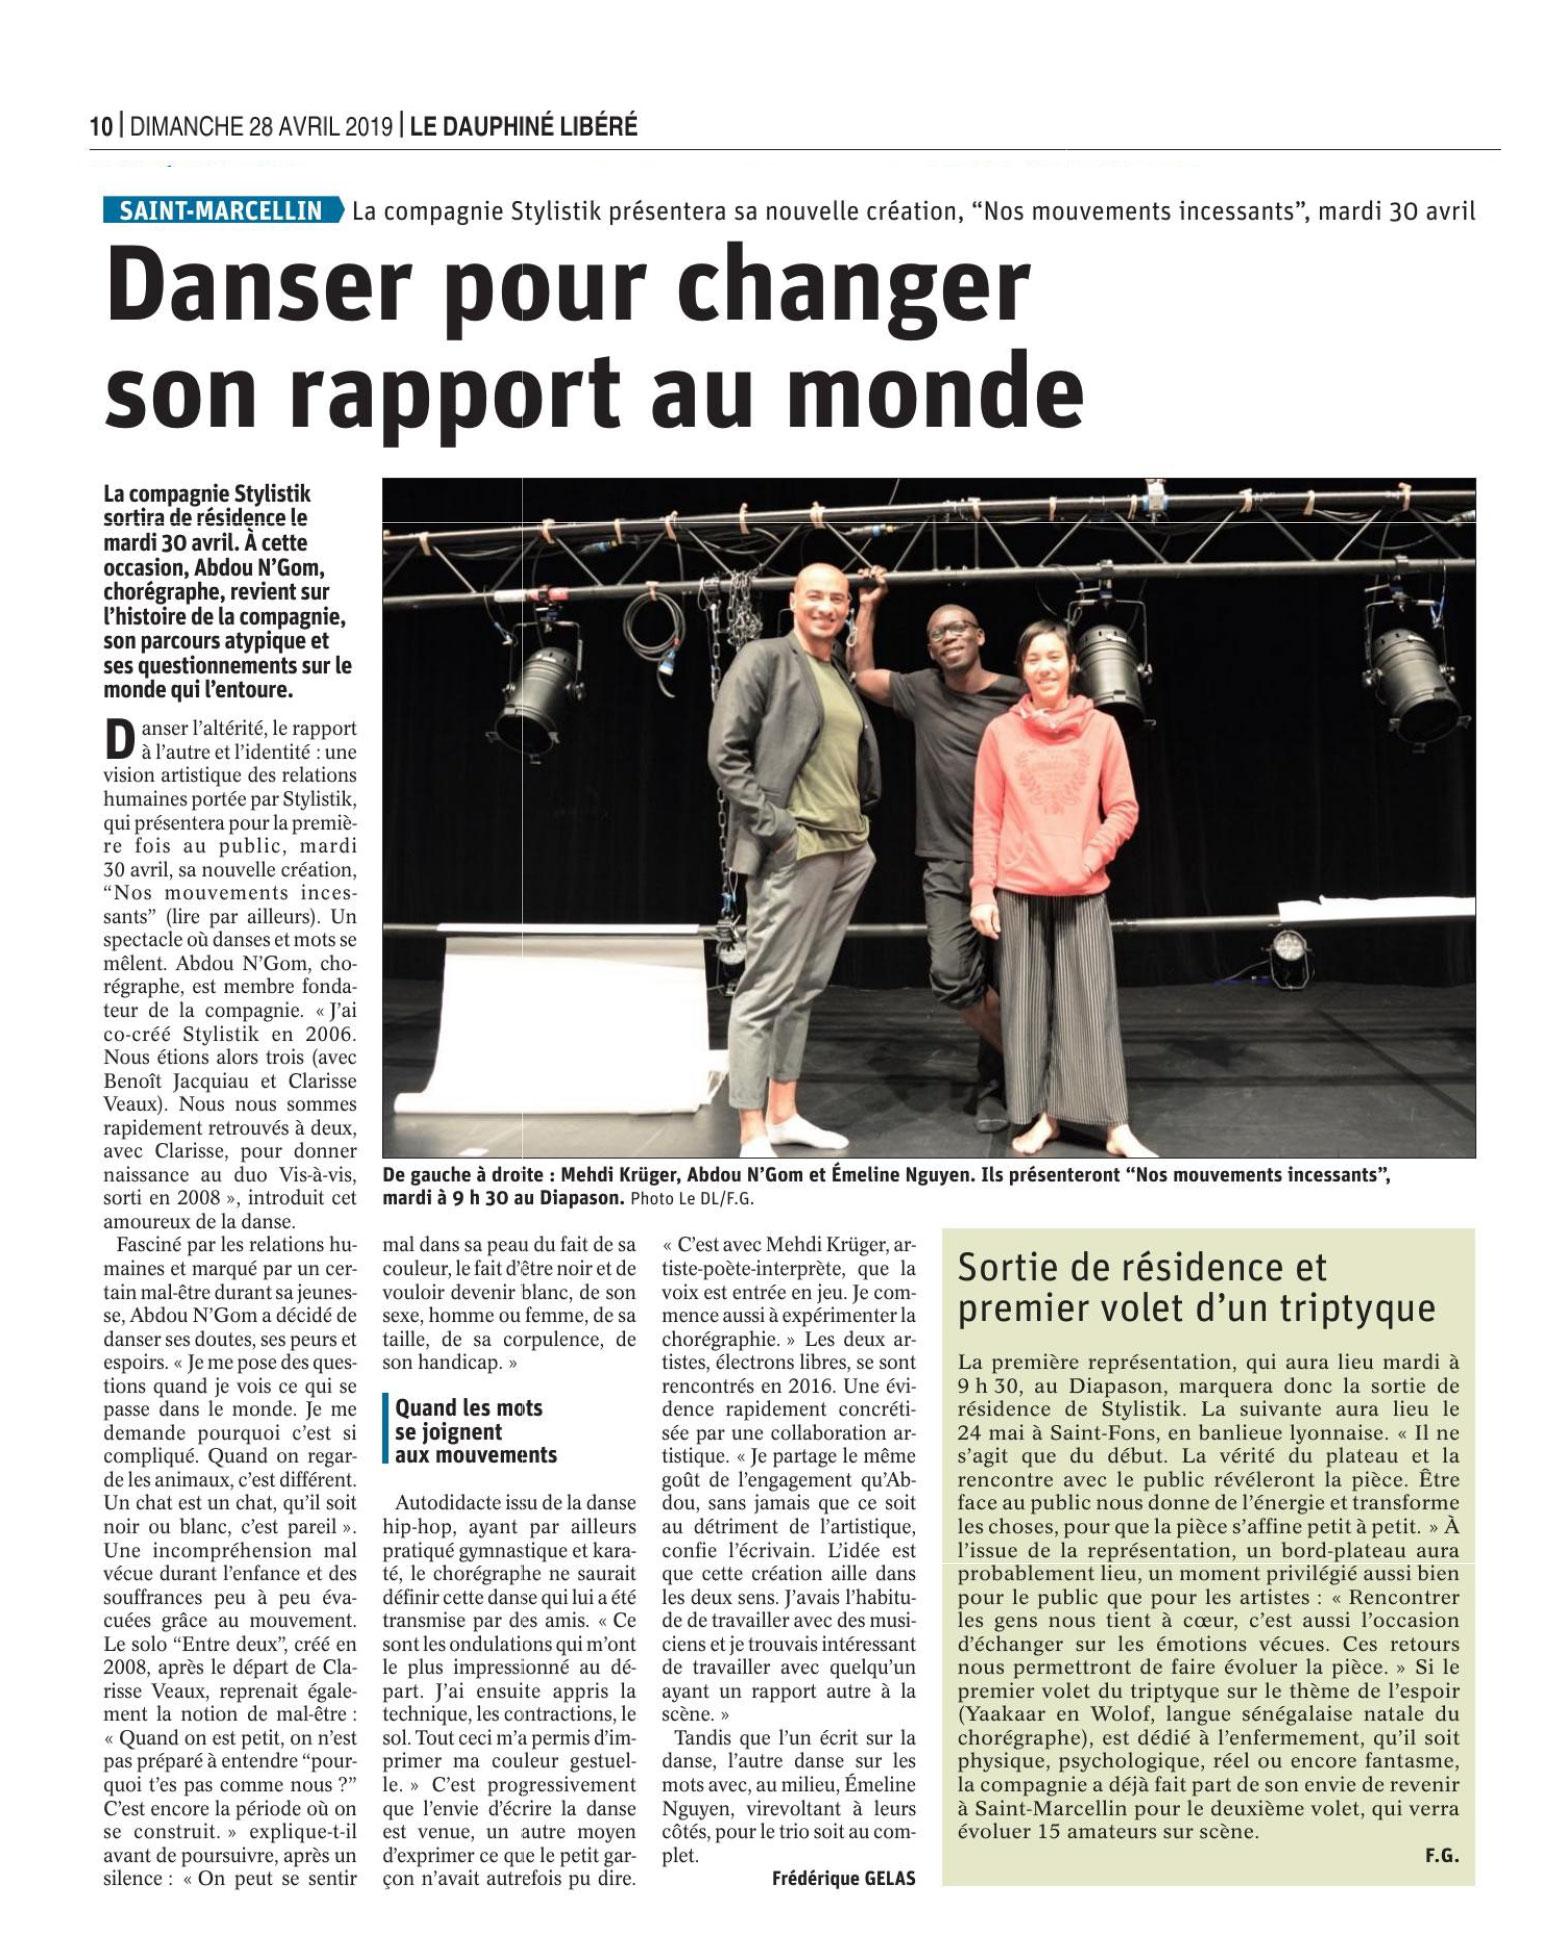 NMI-Article_Le-Dauphine-Libere_Saint-Marcellin_Residence-Diapason_28-04-19.jpg